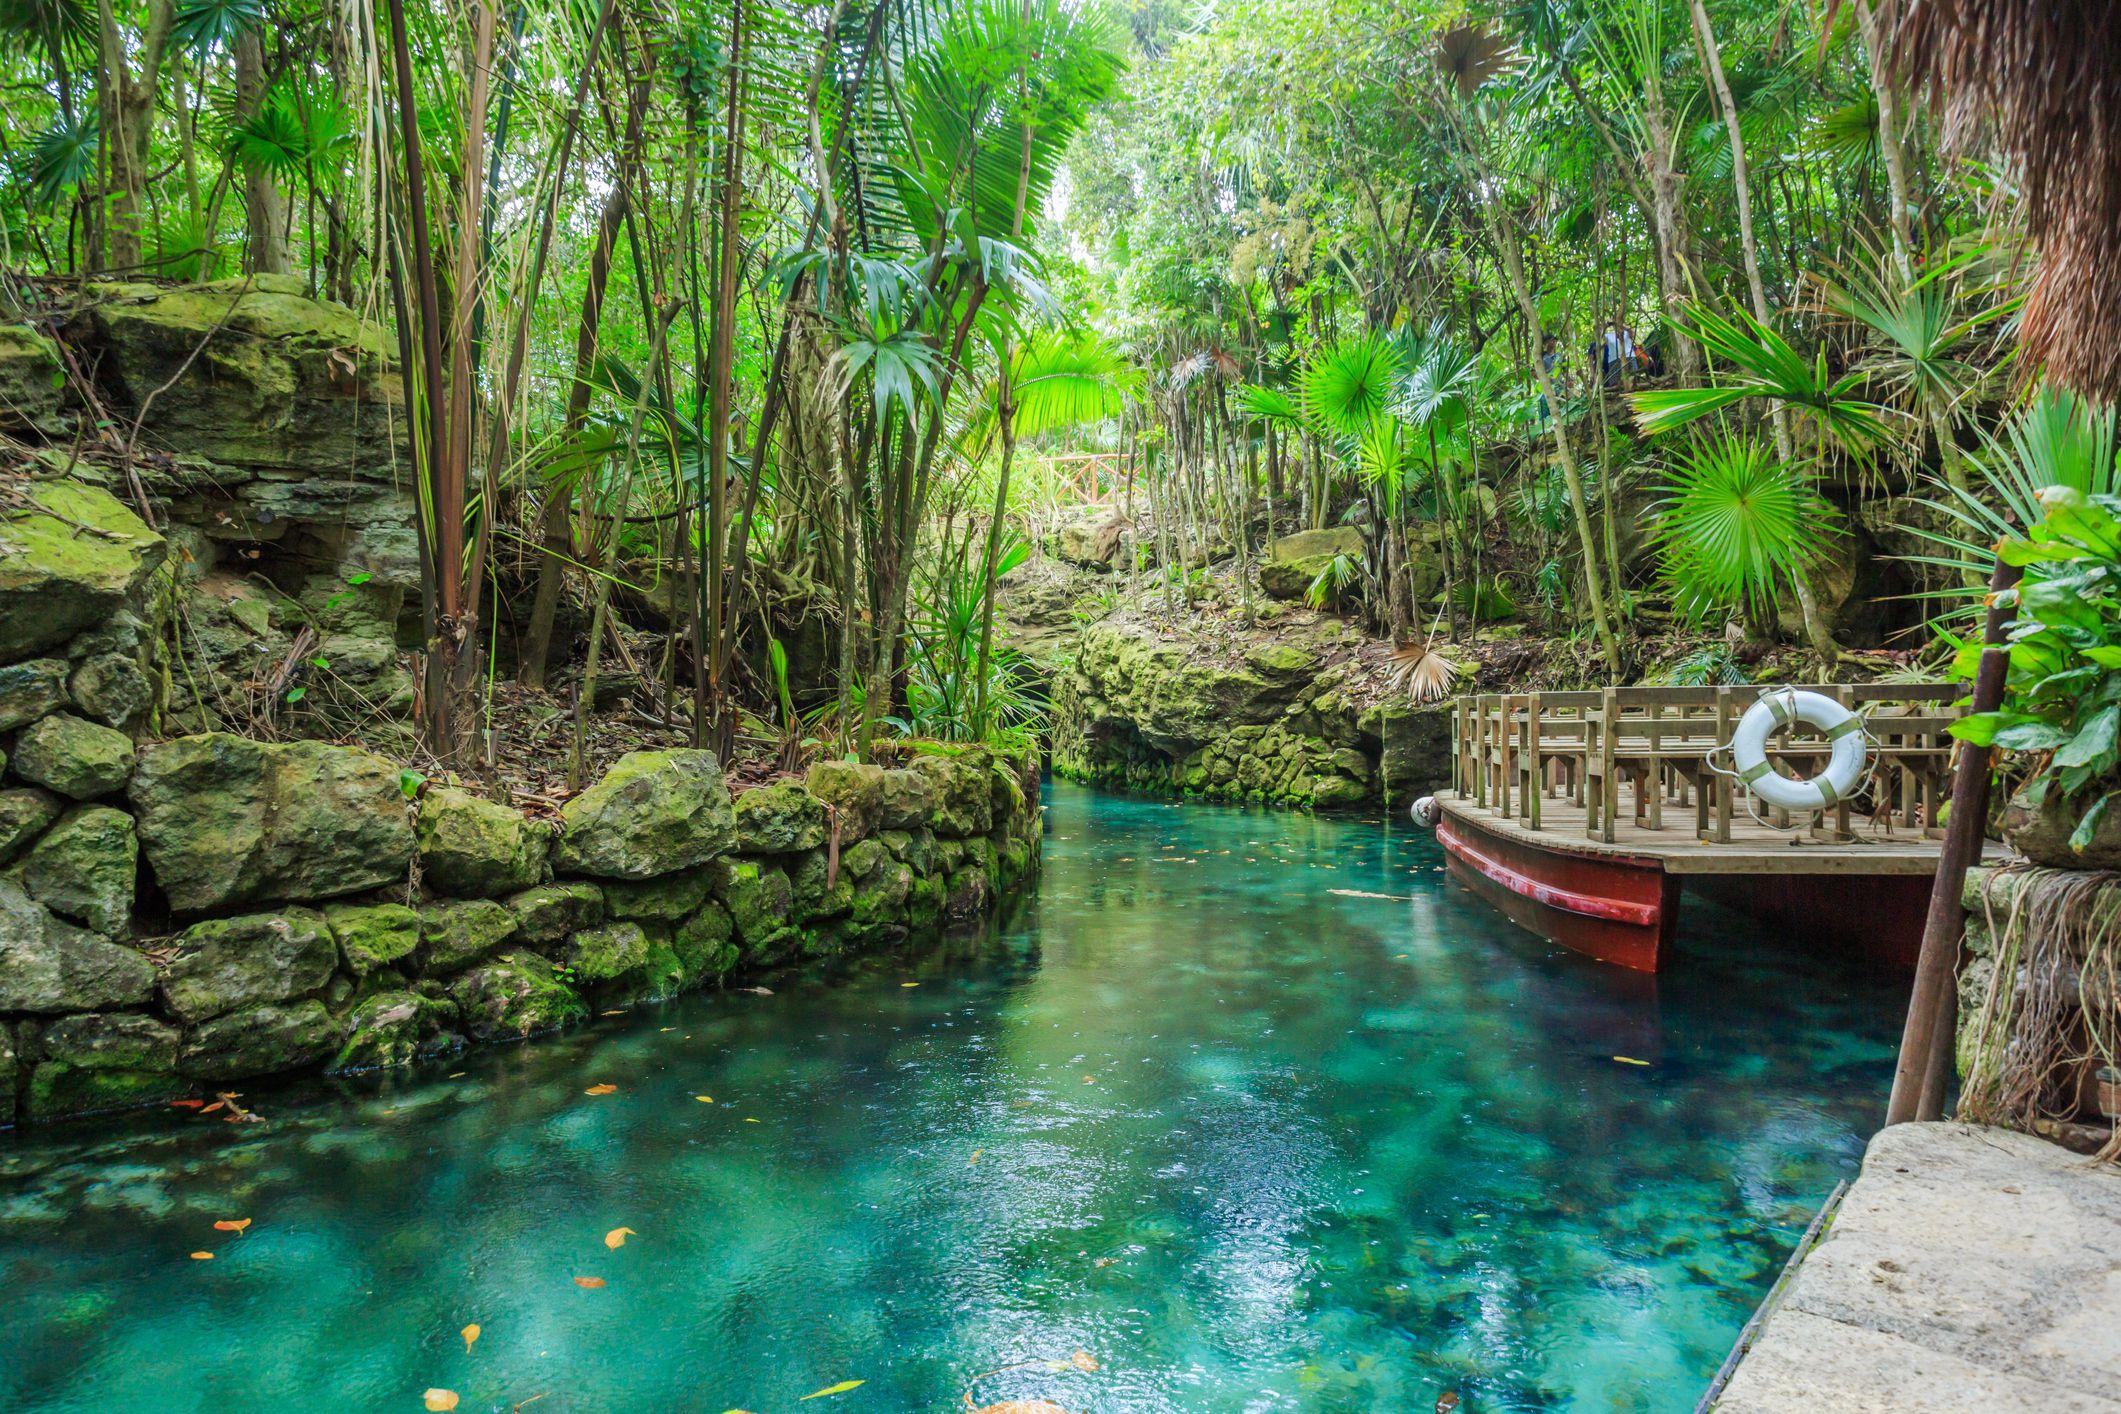 Xcaret Mayan Riviera